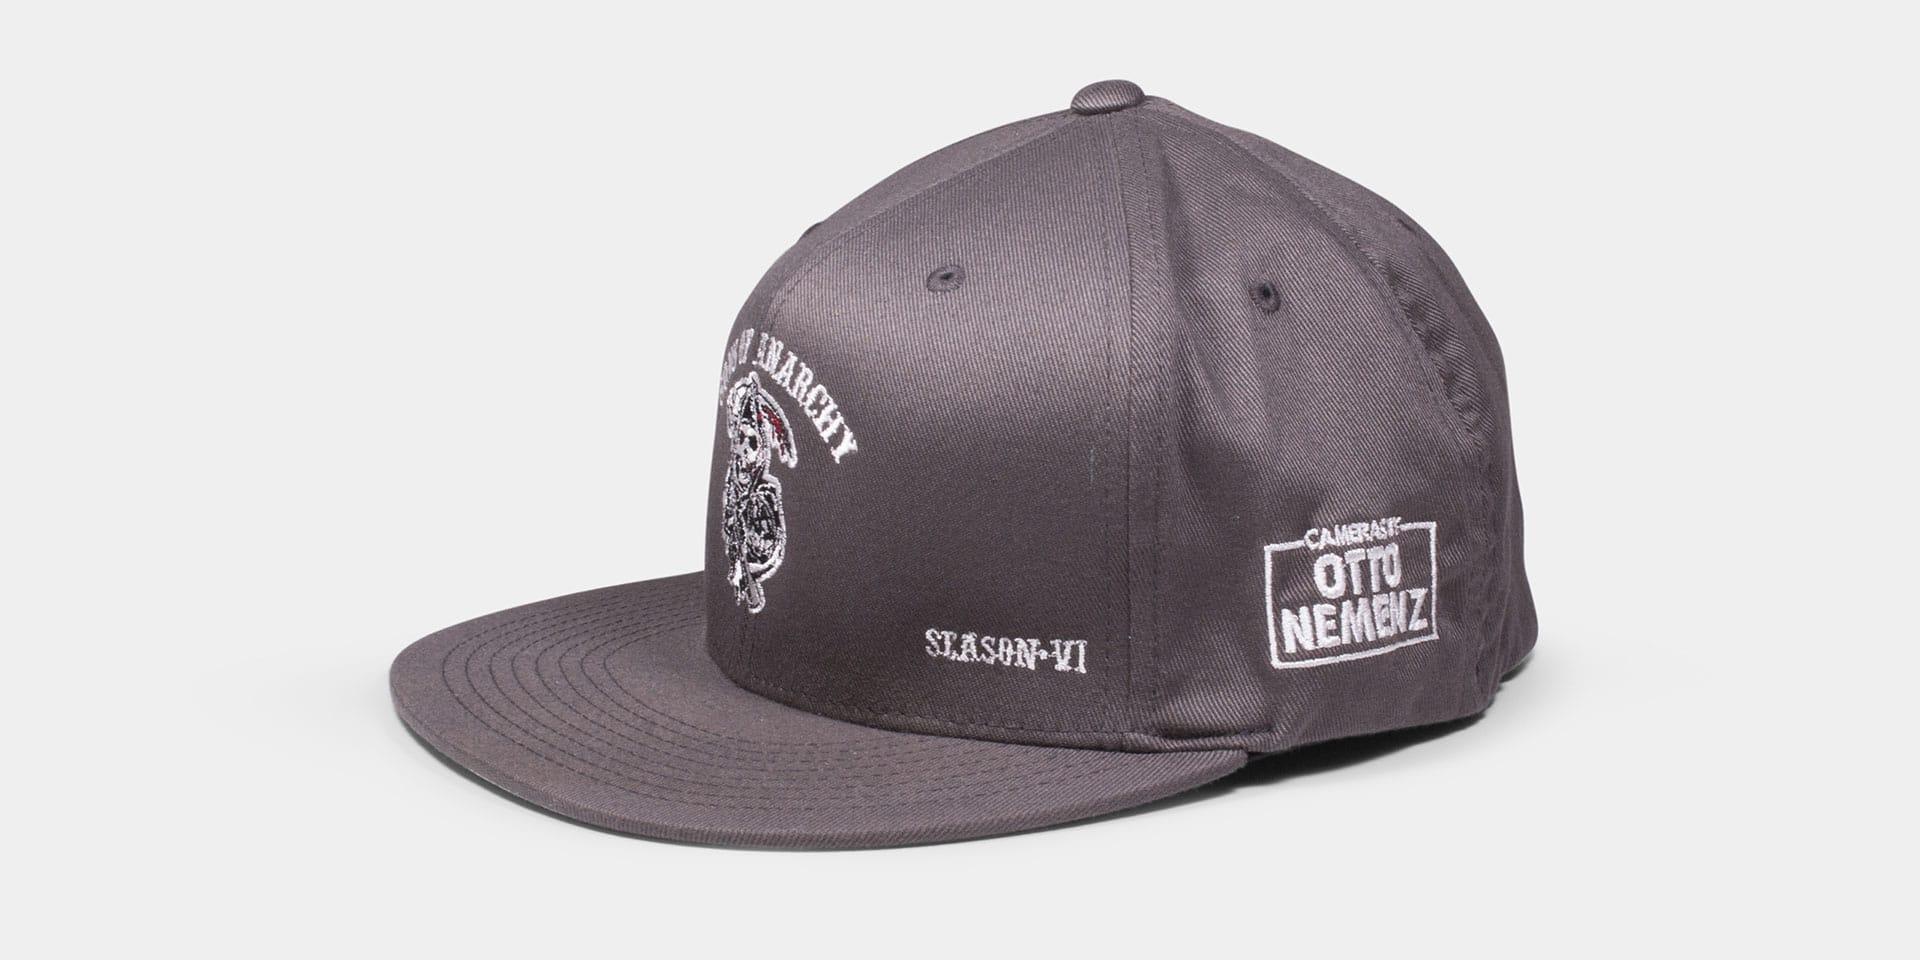 CustomBaseball Hats